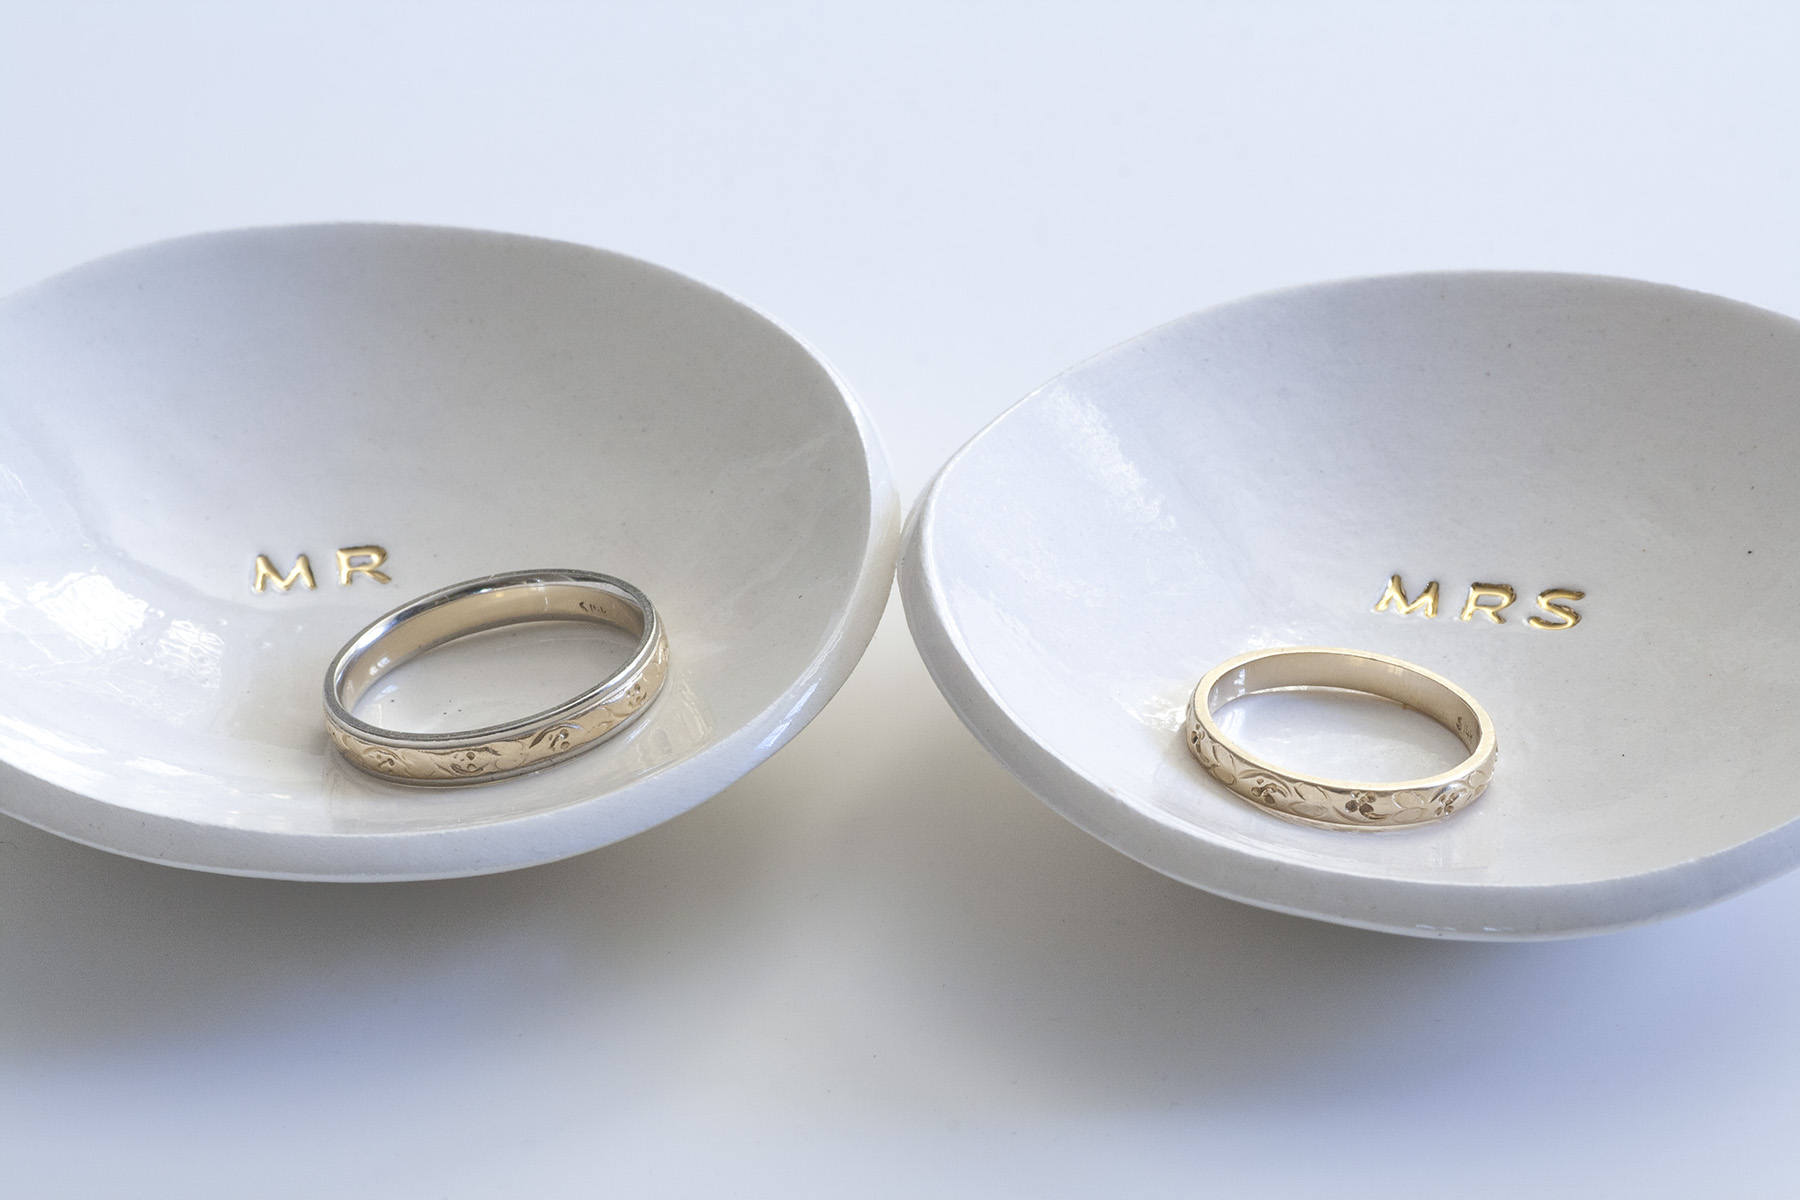 mr and mrs ring dish set